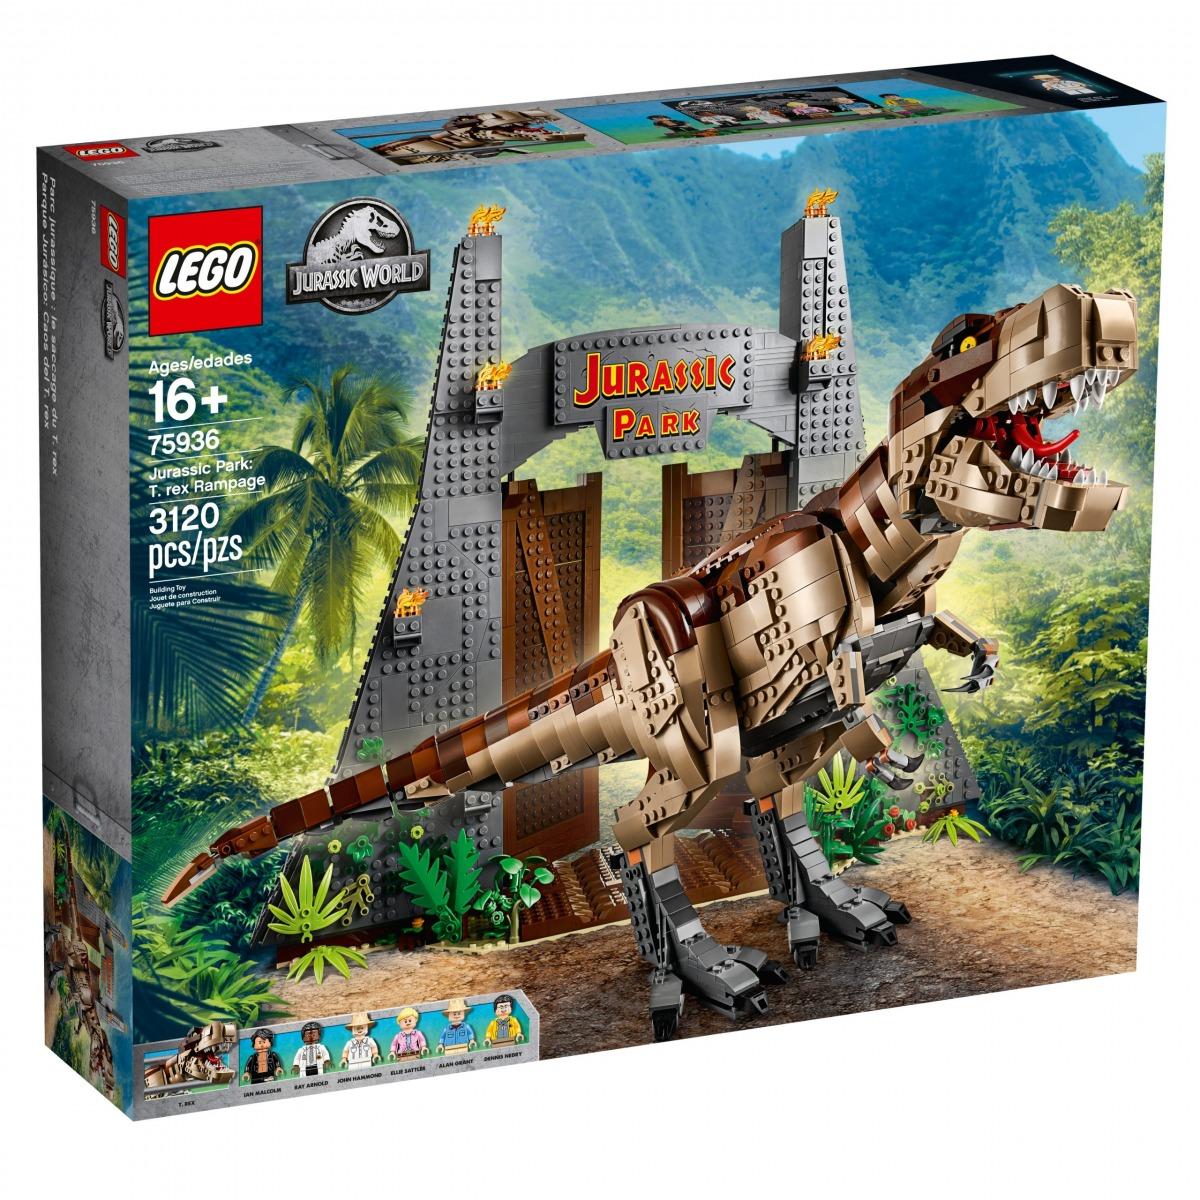 lego 75936 jurassic park le carnage du t rex scaled